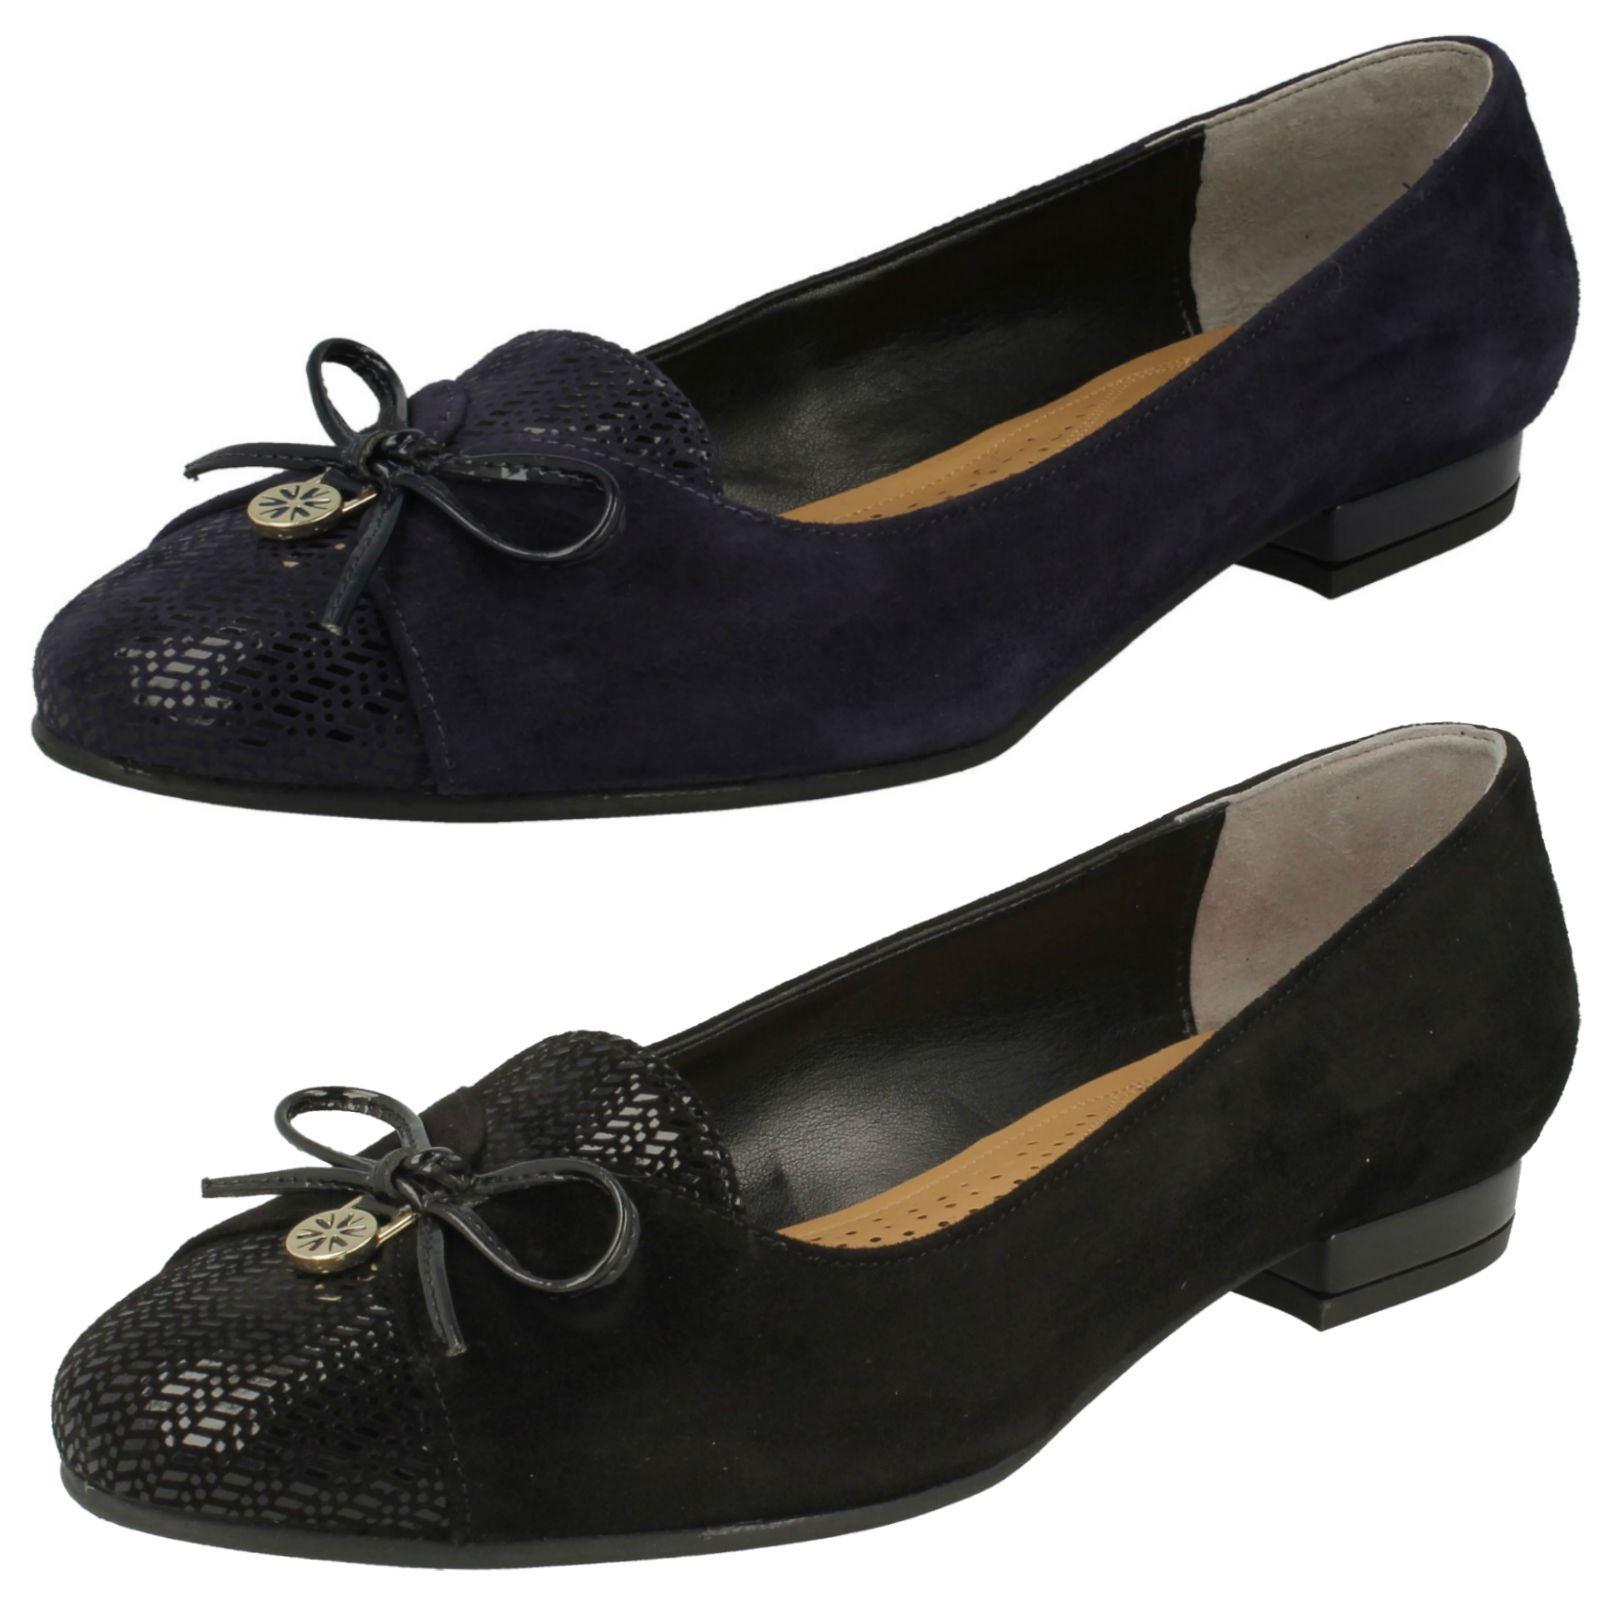 Details about Ladies Van Dal Flat Wide Fitting Flat Shoes  Seneca  af8c0b51c